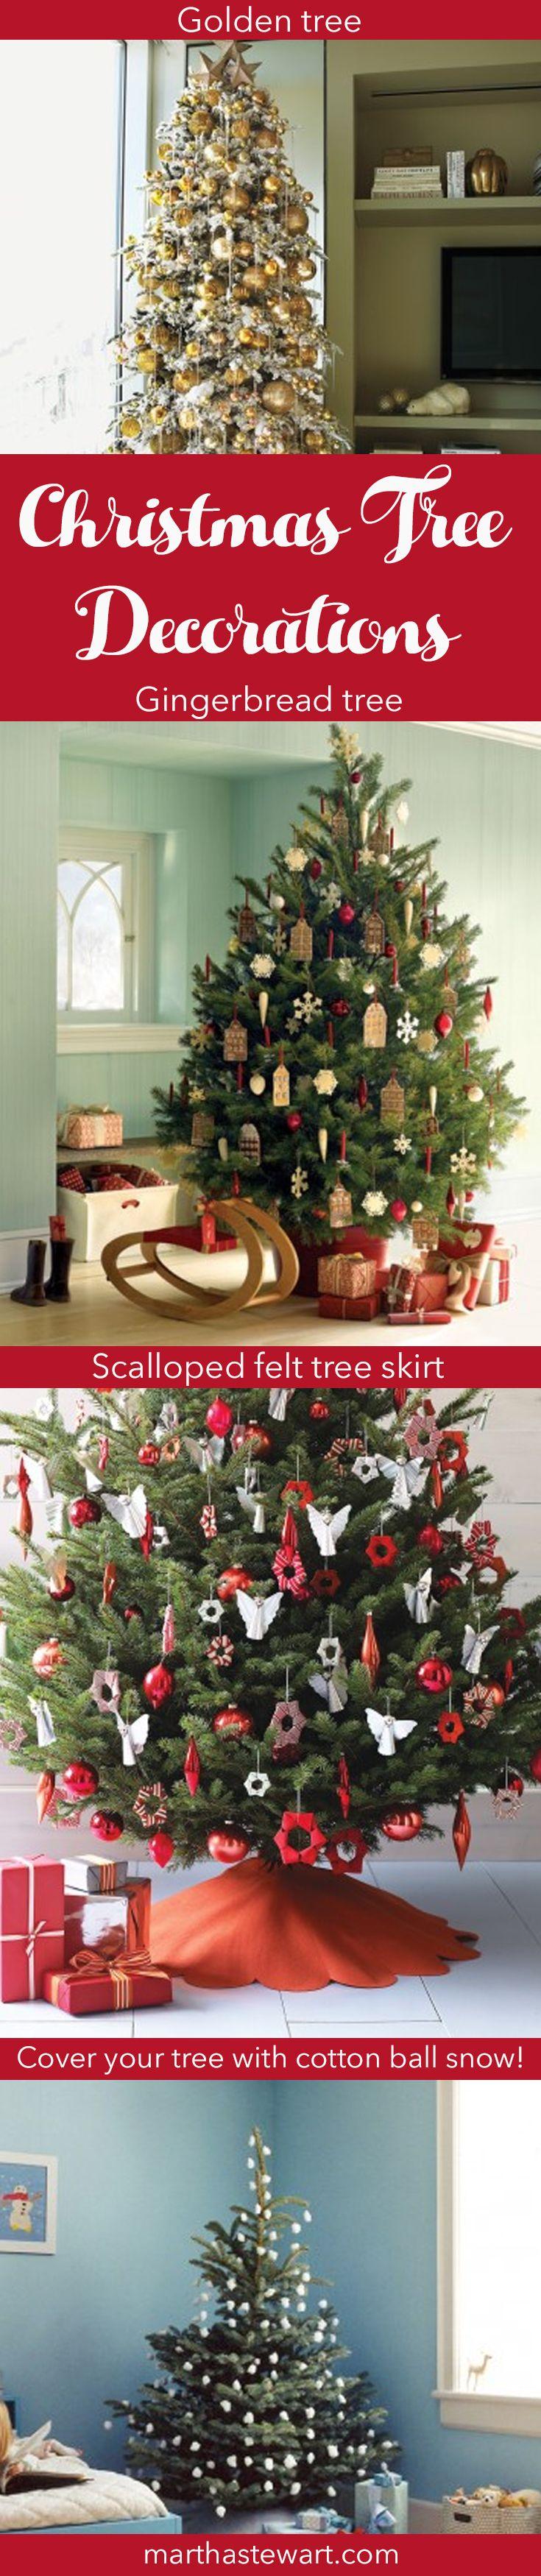 Leather Statement Clutch - Christmas Snow Trees by VIDA VIDA Qs6ZImzj